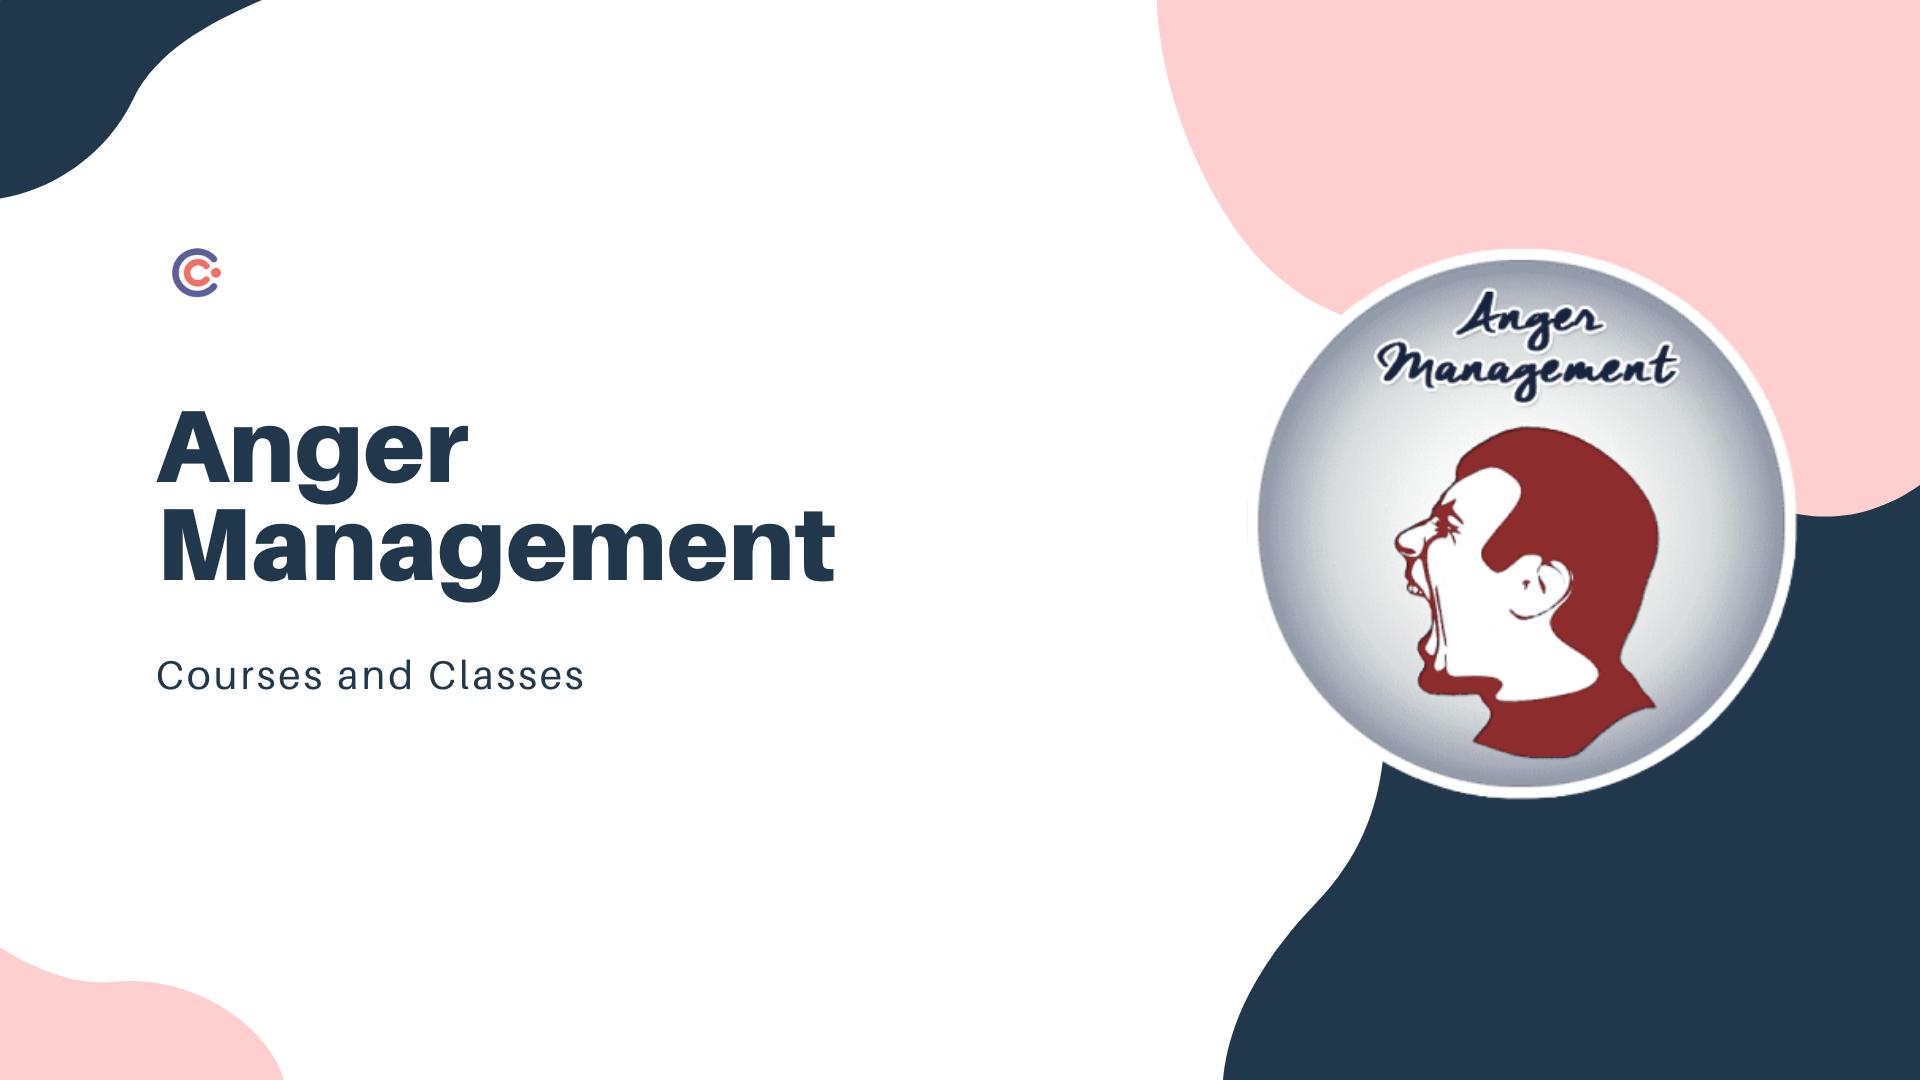 6 Best Anger Management Classes online